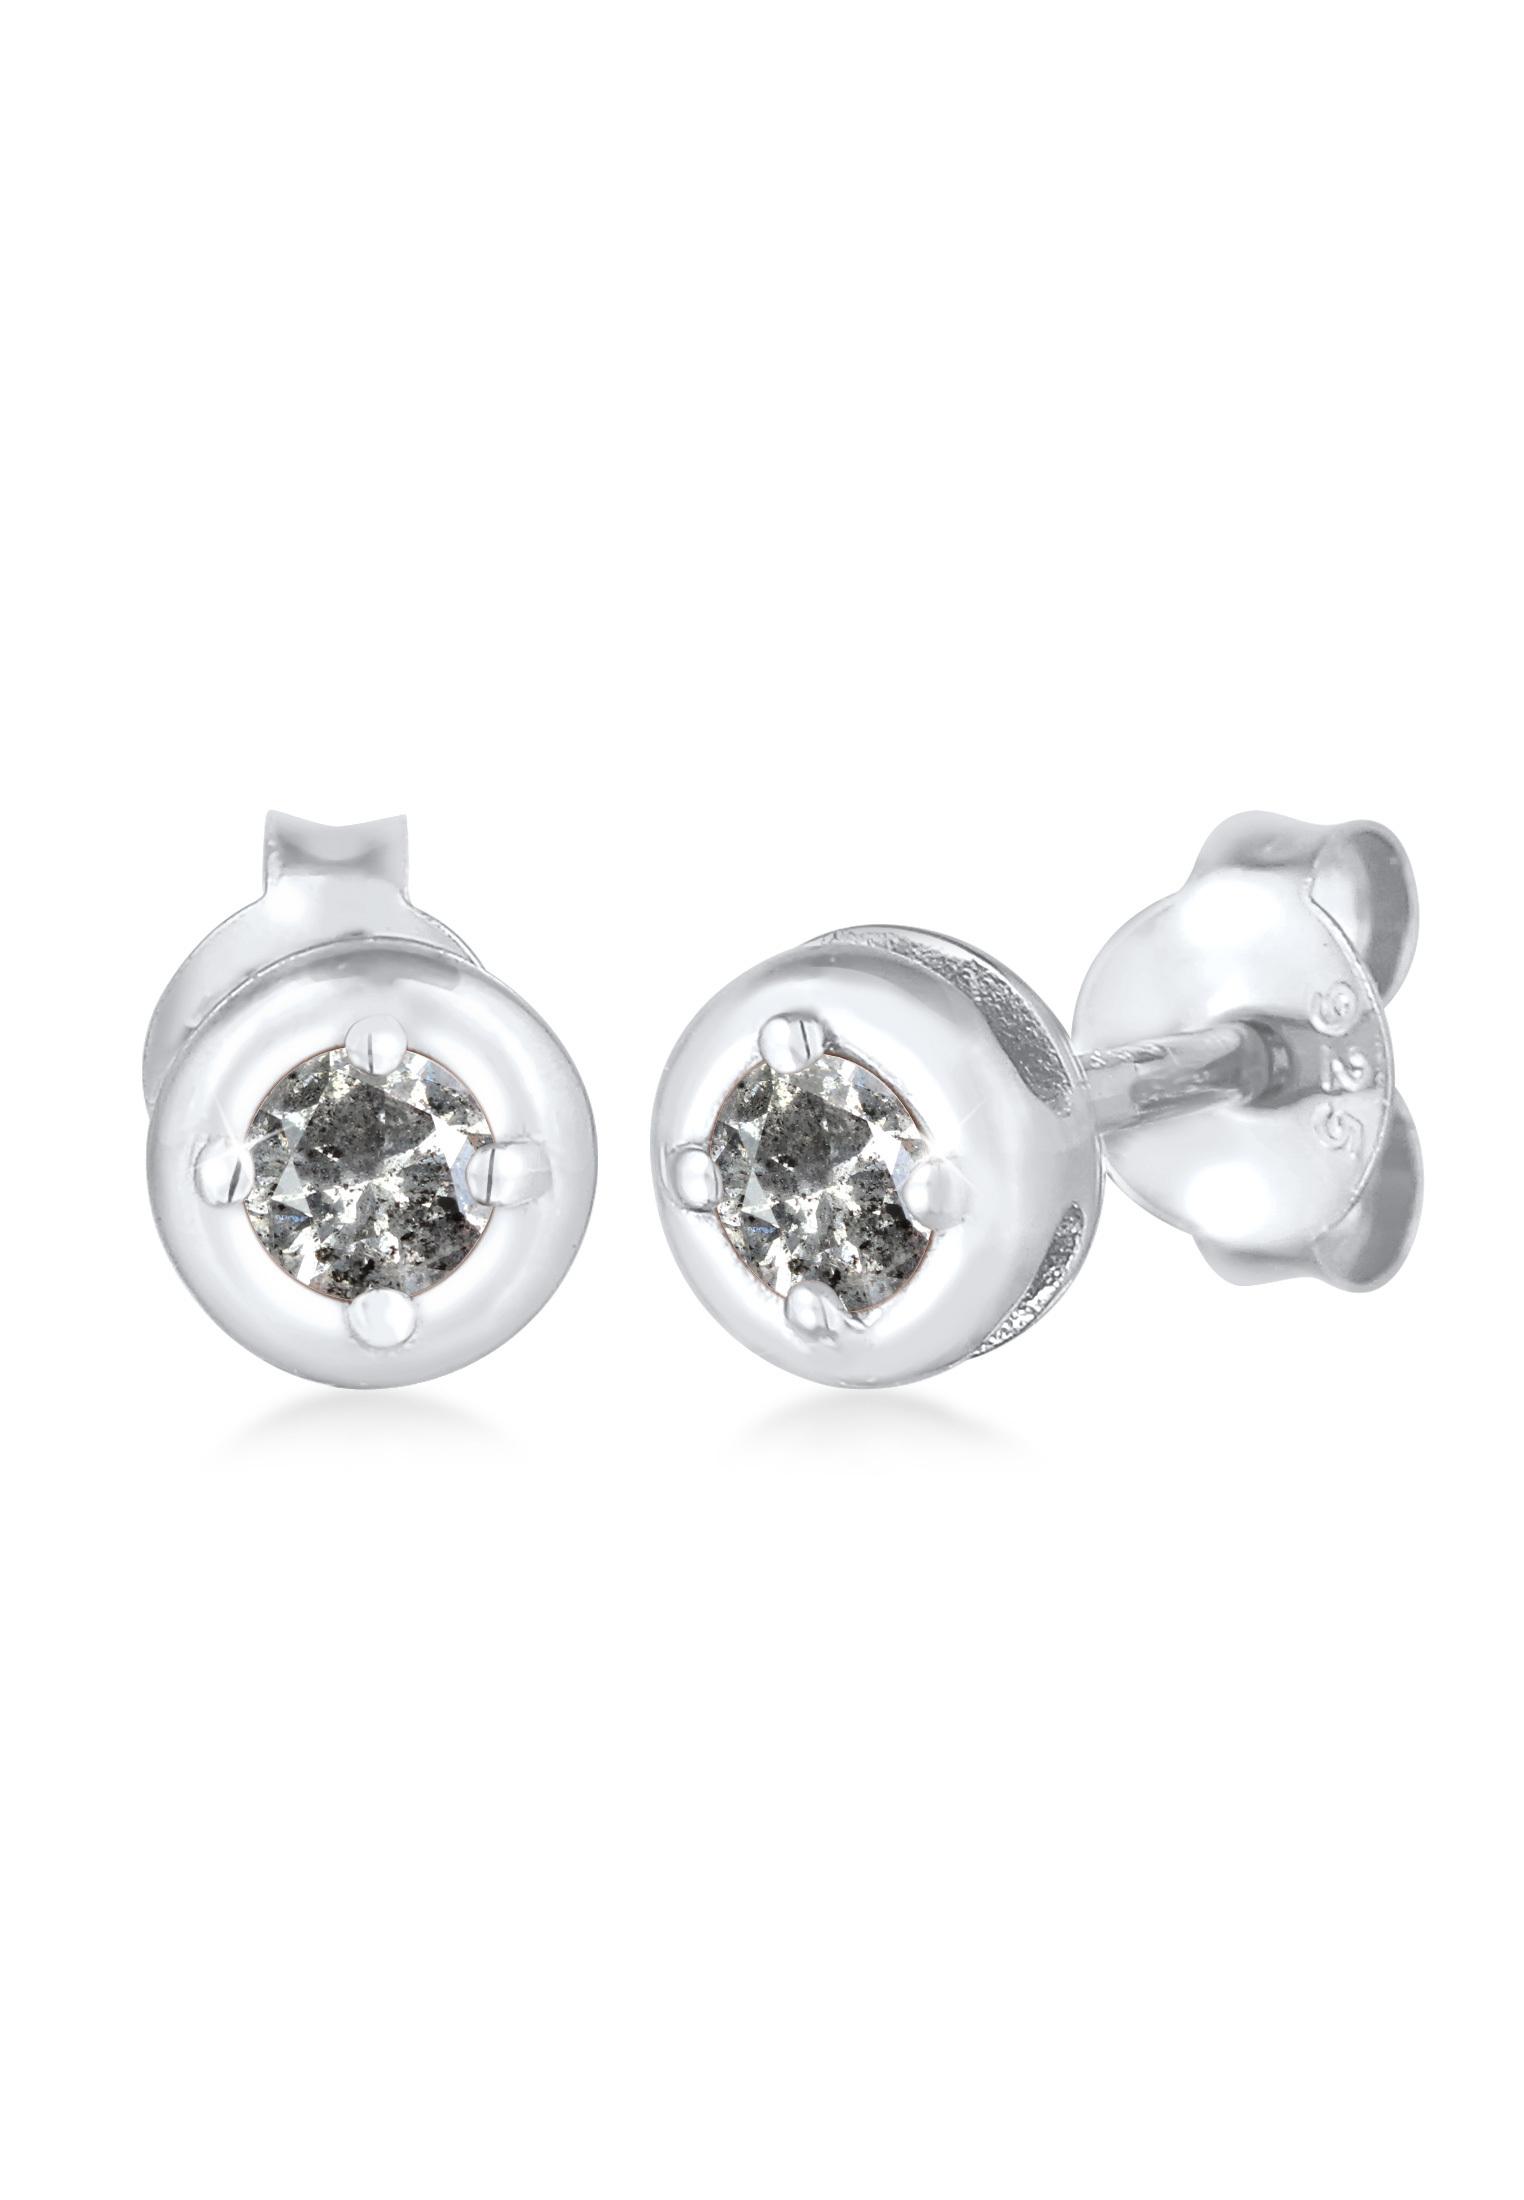 Ohrstecker   Salt & Pepper Diamant (0.11 ct.)   925er Sterling Silber